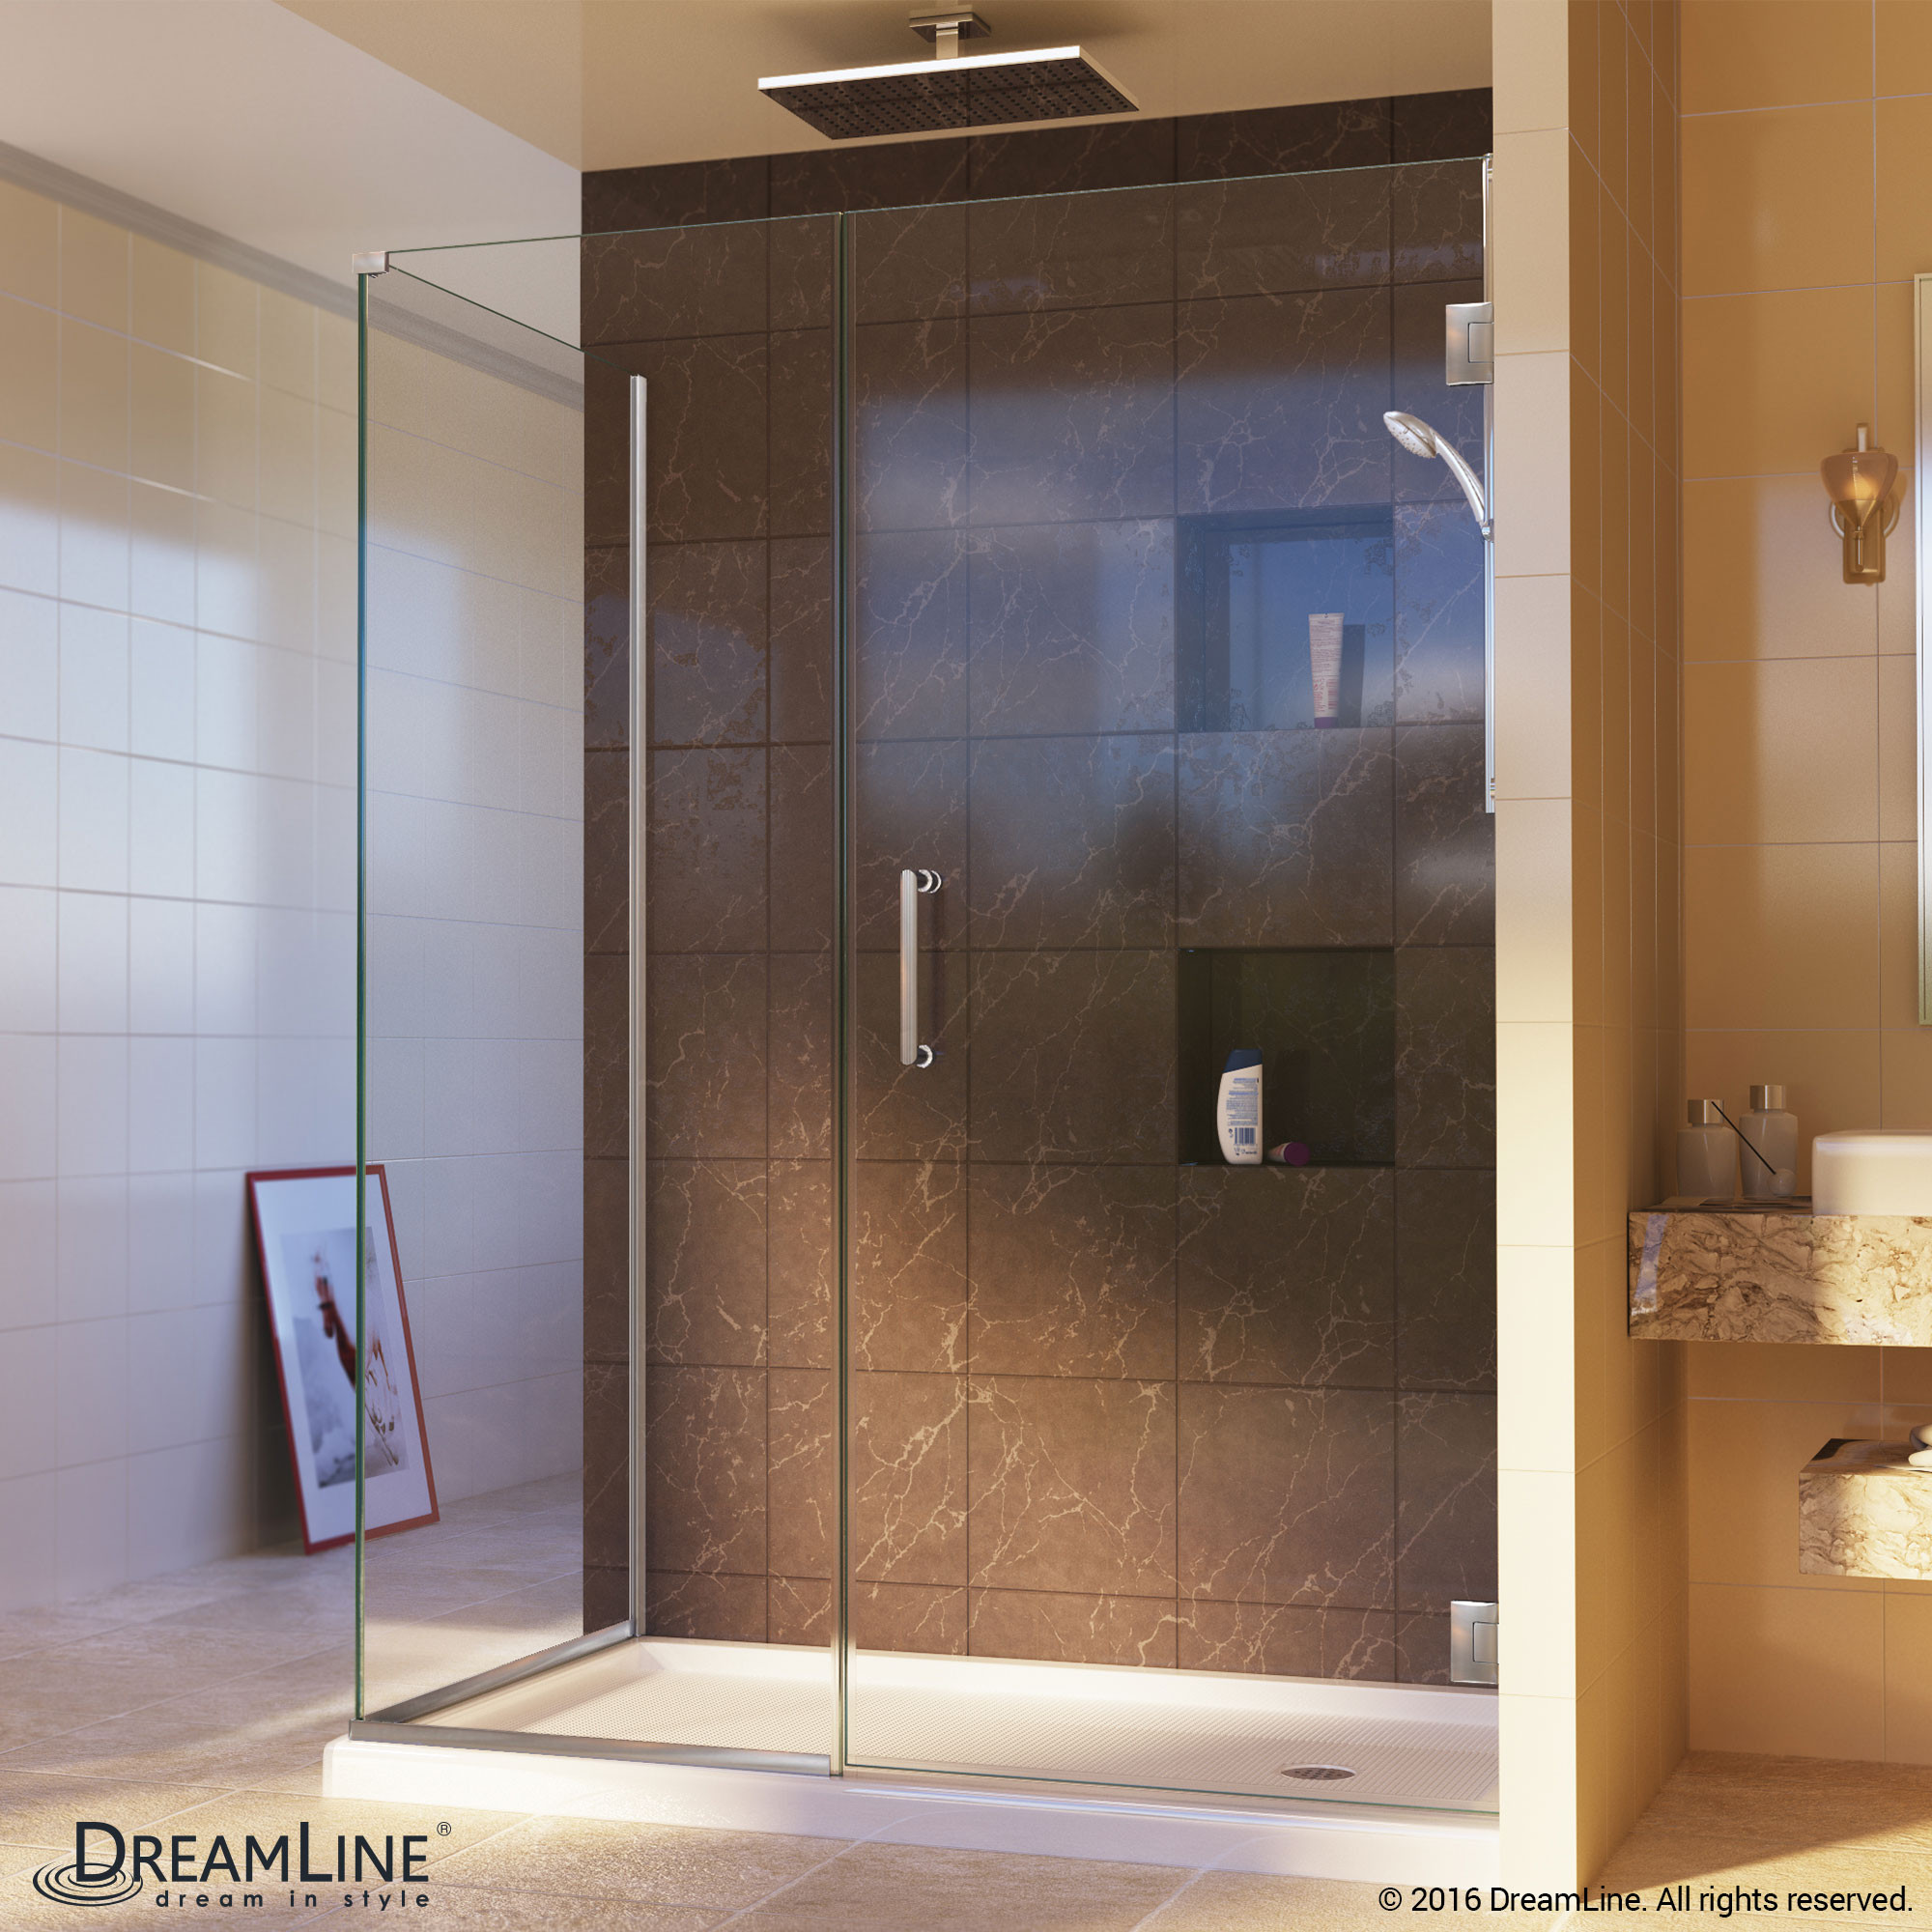 DreamLine SHEN-24405340-04 Unidoor Plus Hinged Shower Enclosure In Brushed Nickel Finish Hardware